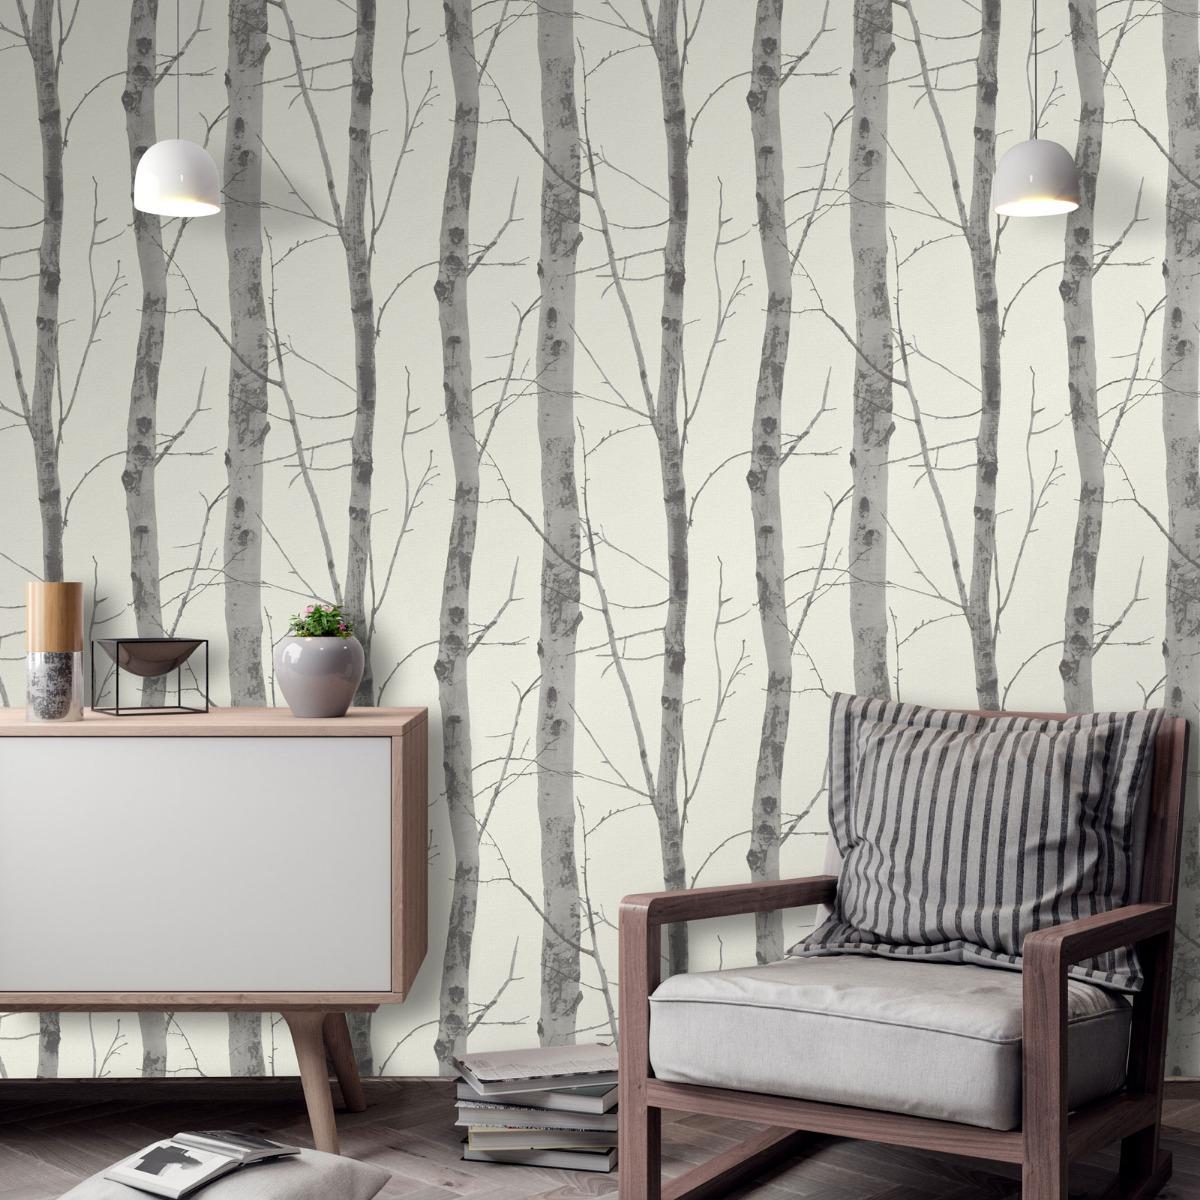 Erismann Birch Trees Wallpaper Cream/Grey (5433-47-BUR)